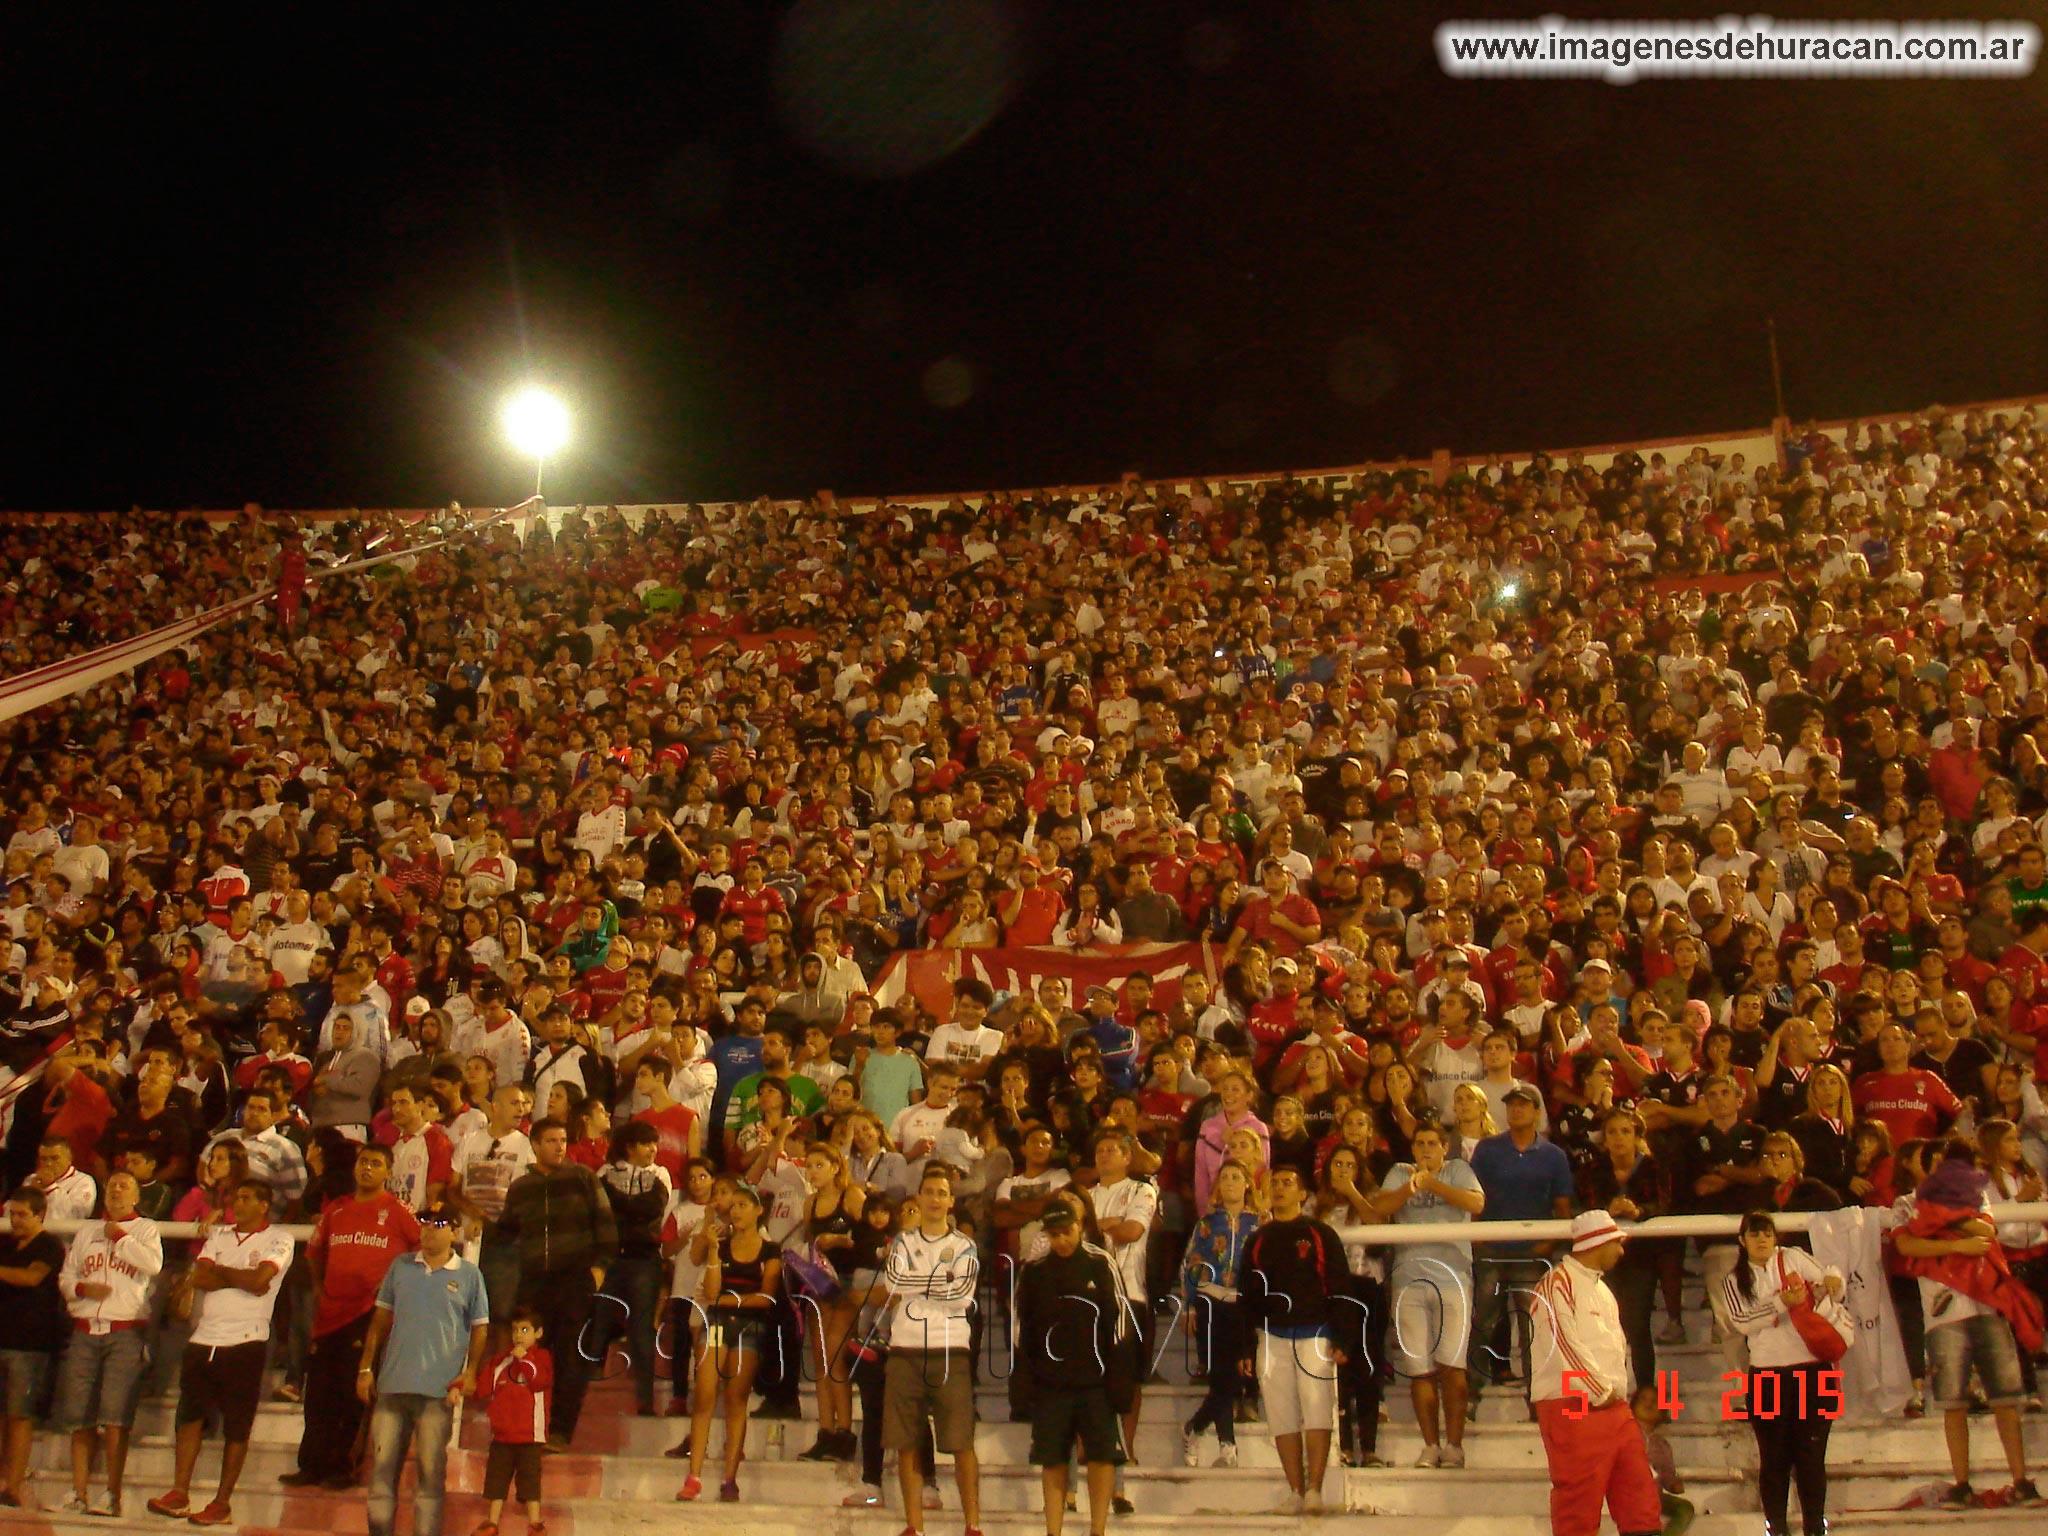 huracán vs boca juniors fecha 08 torneo de primera división 2015